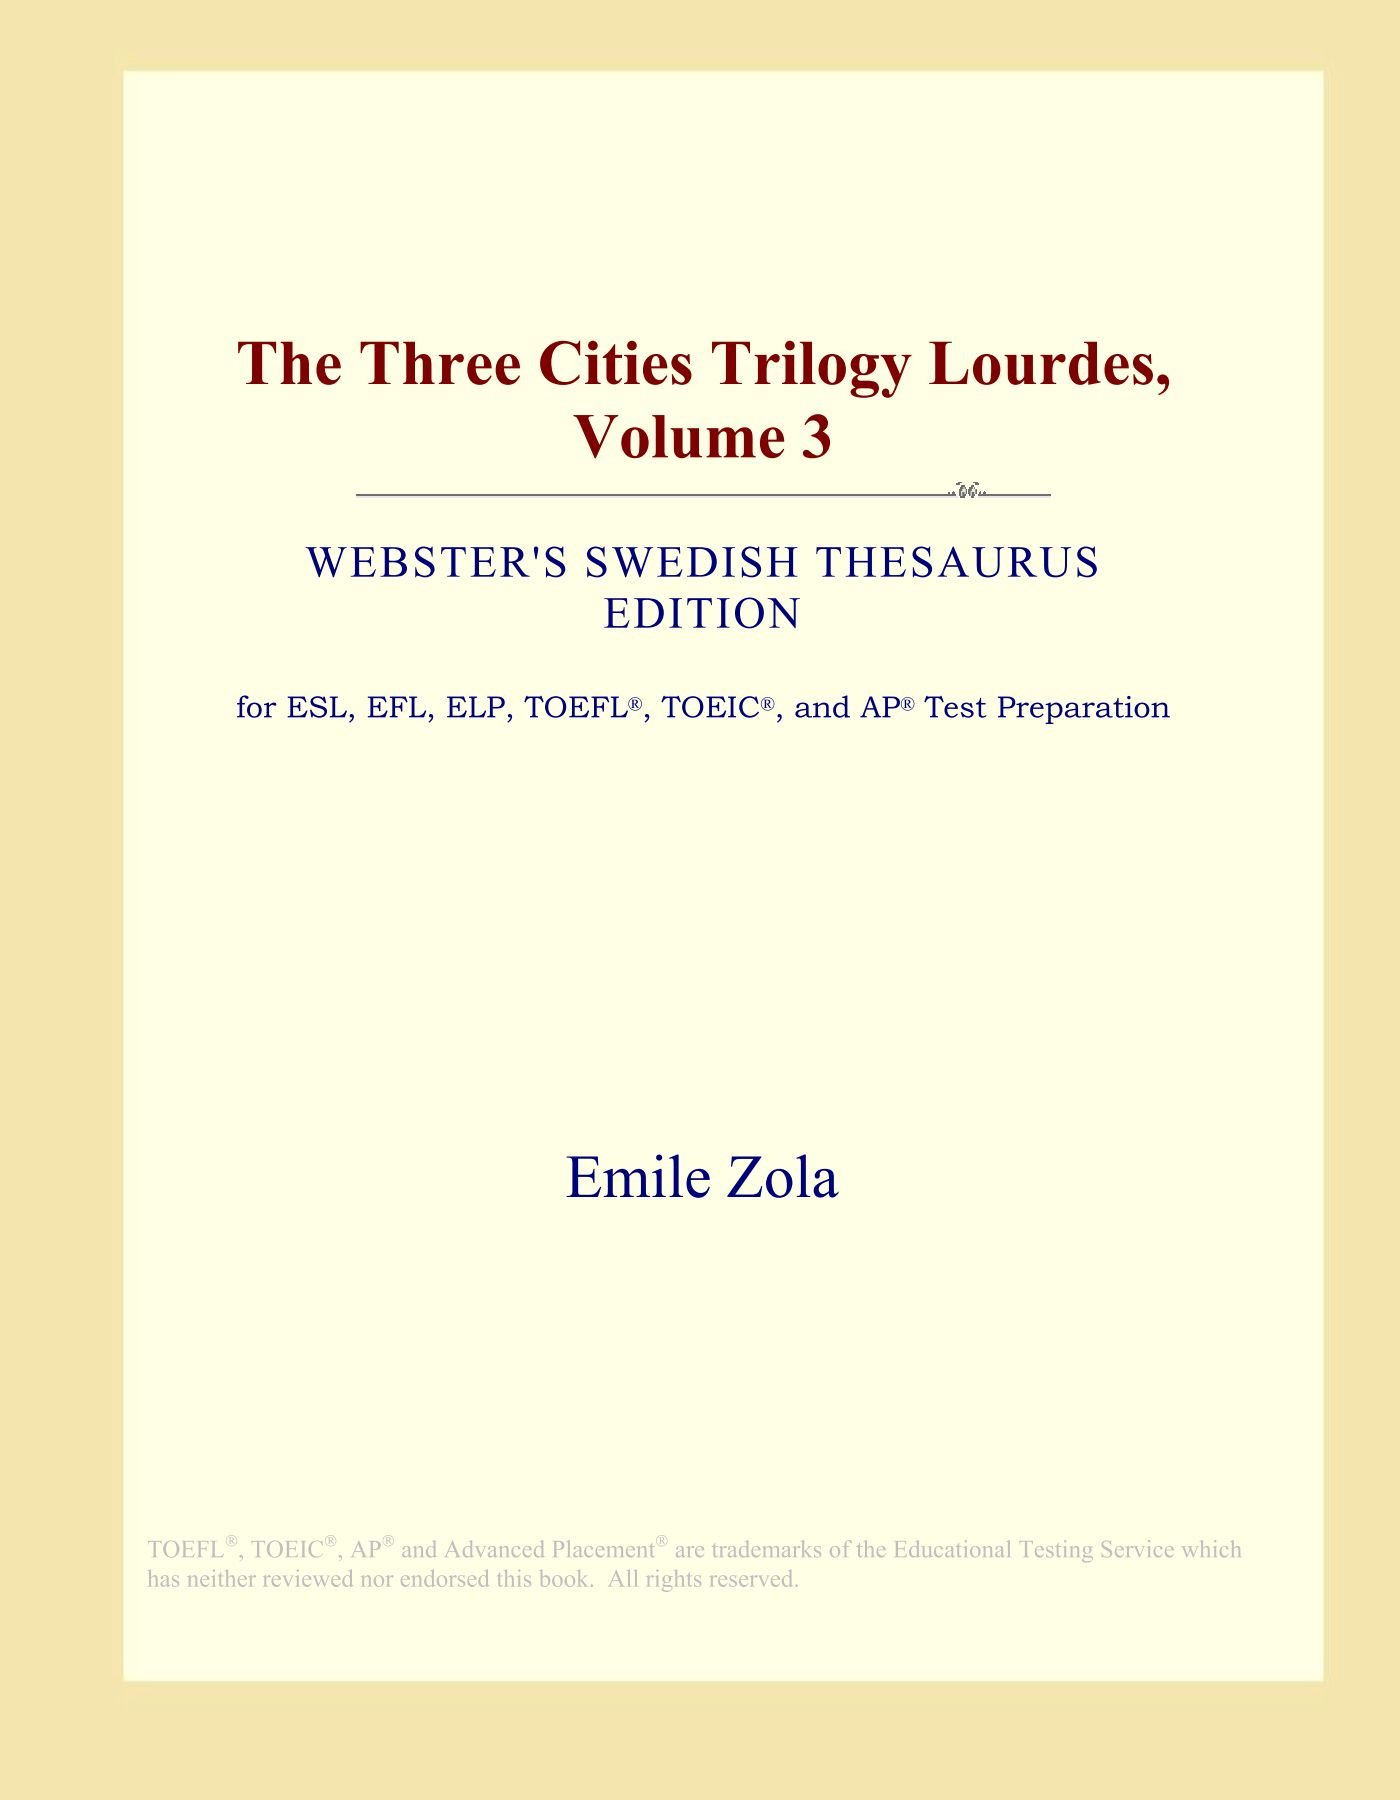 The Three Cities Trilogy Lourdes, Volume 3 (Webster's Swedish Thesaurus Edition) pdf